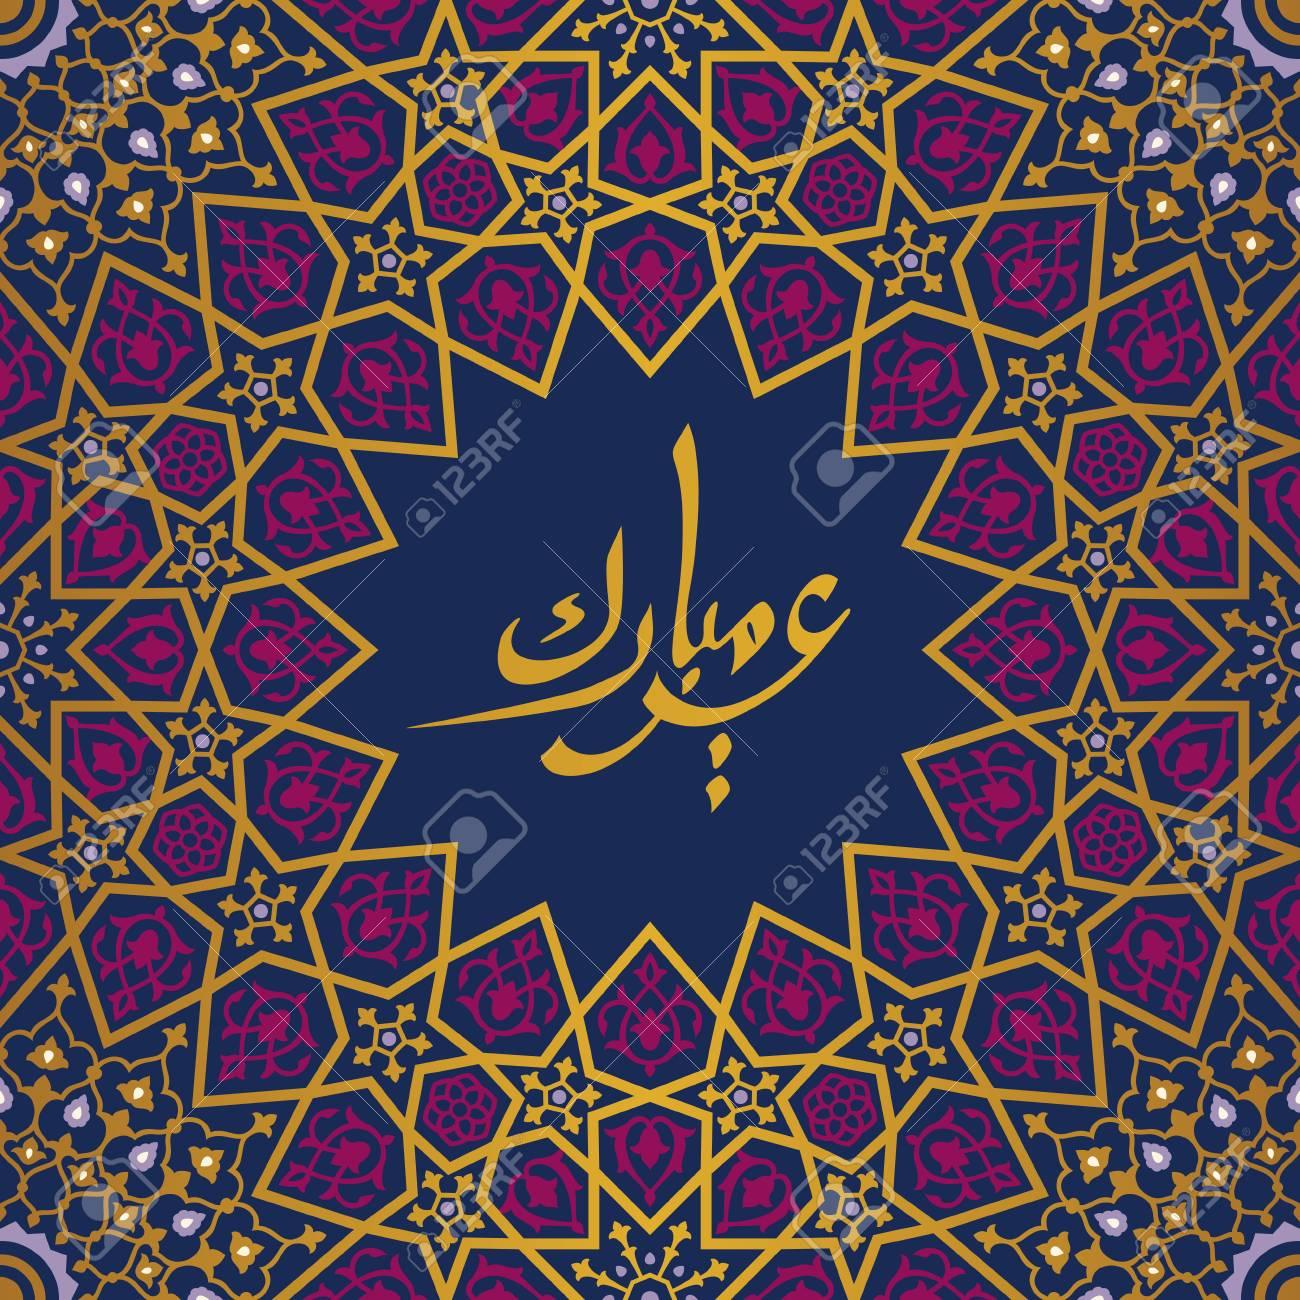 Ramadan Kareem beautiful greeting card, arabic calligraphy ''Ramadhan karim'' islamic background